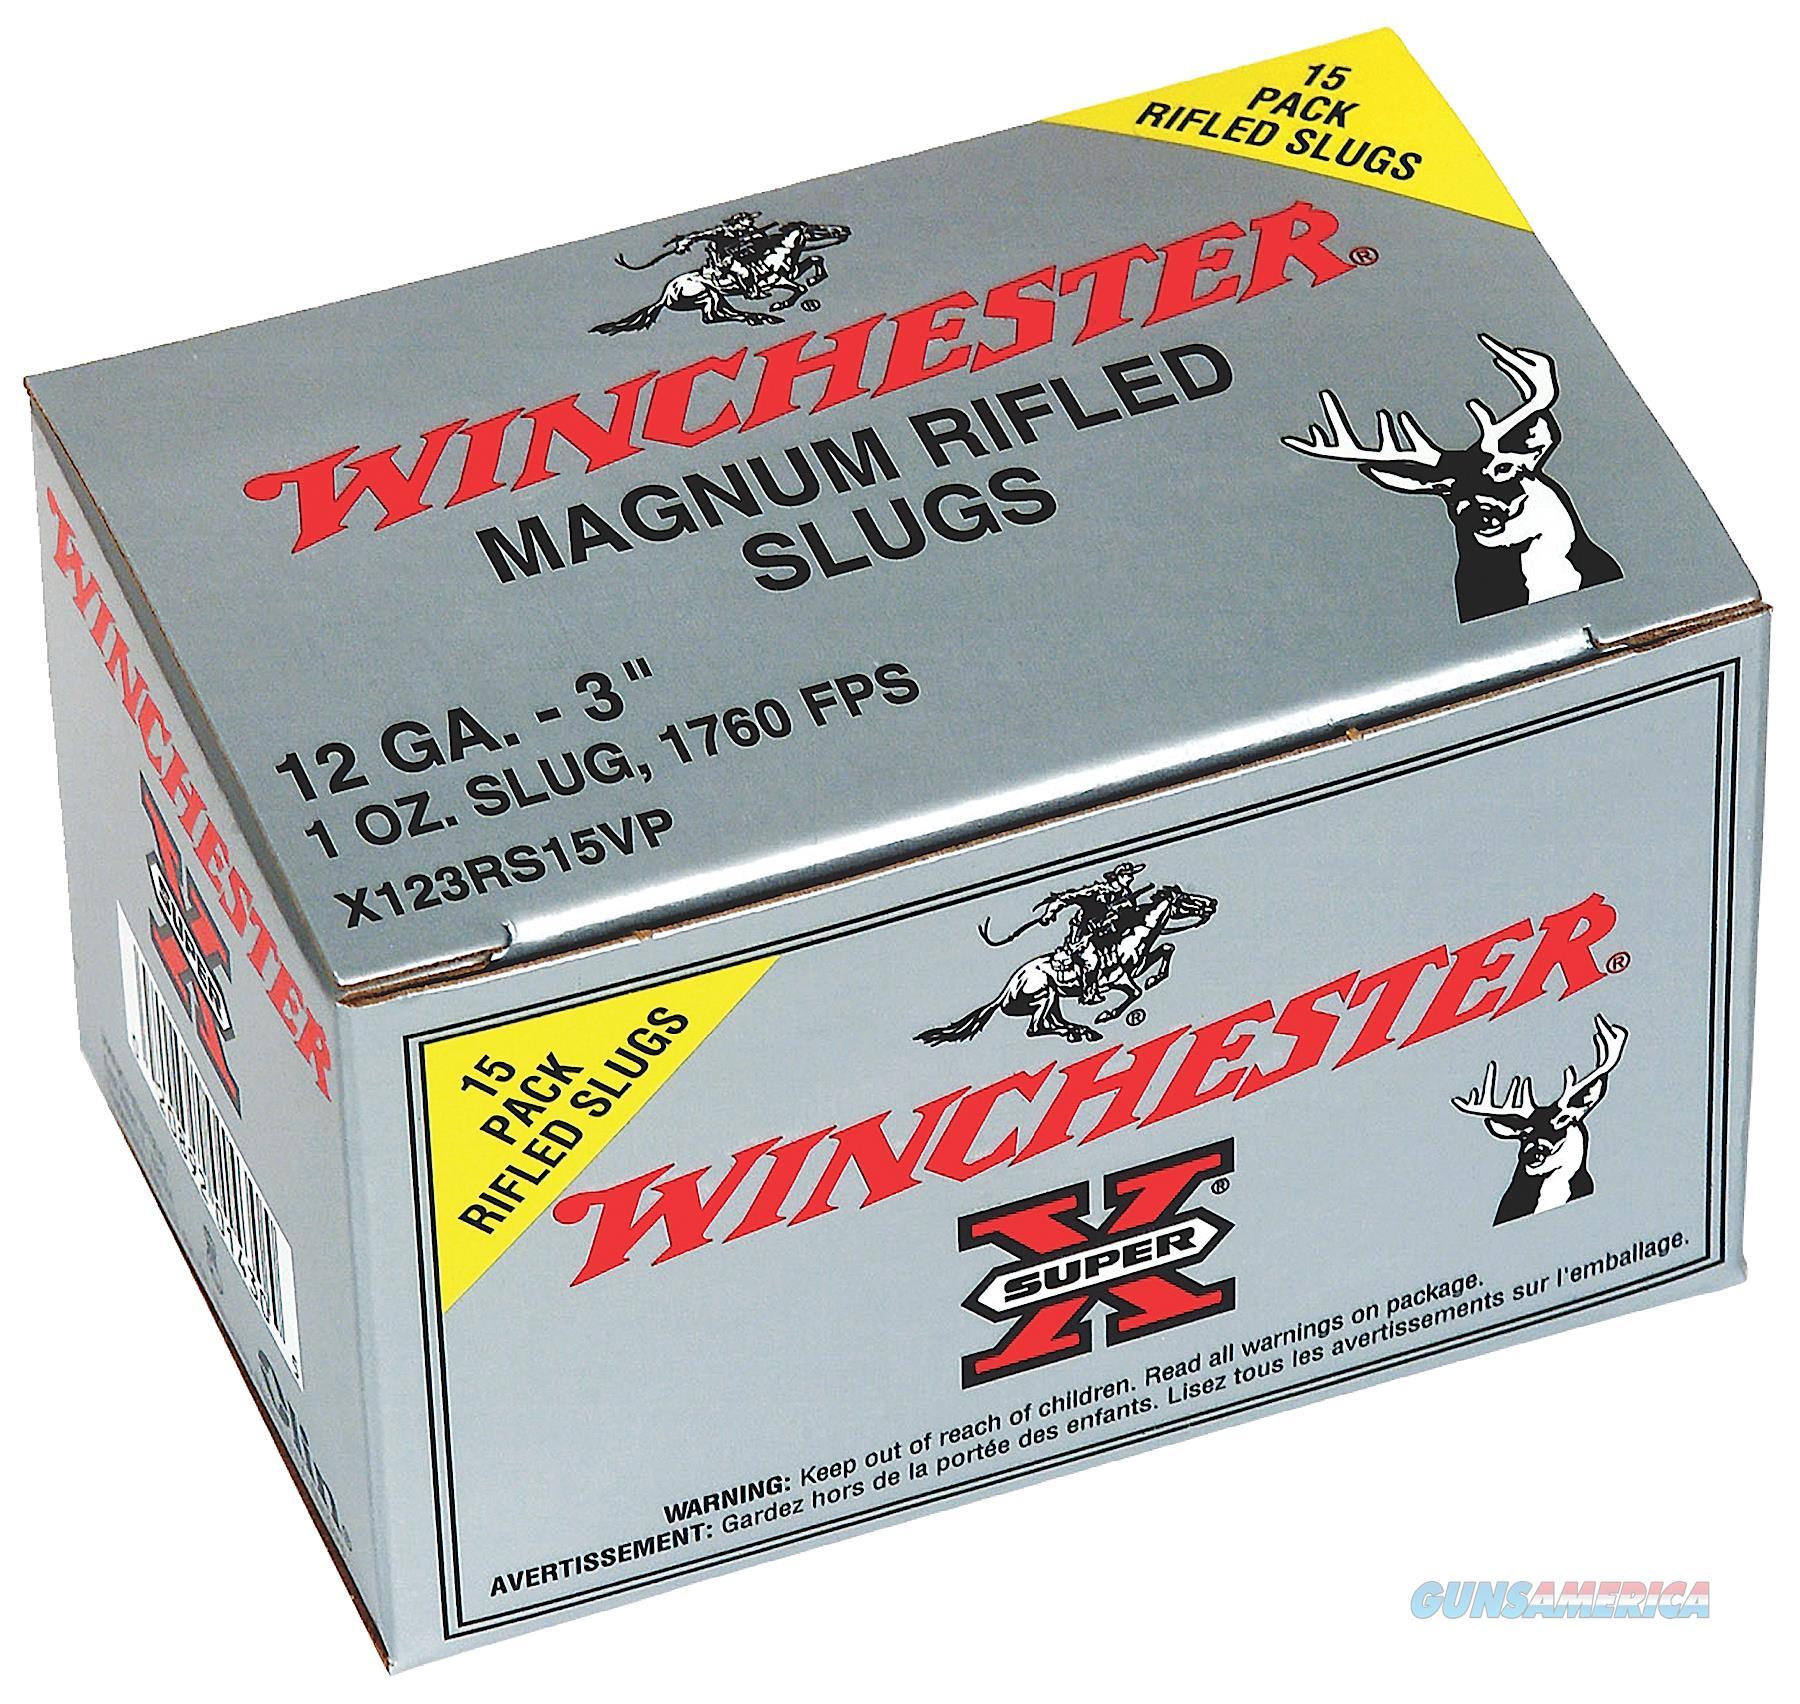 Winchester Ammo Super-x, Win X123rs15vp Supx            Slug  15-10  Guns > Pistols > 1911 Pistol Copies (non-Colt)